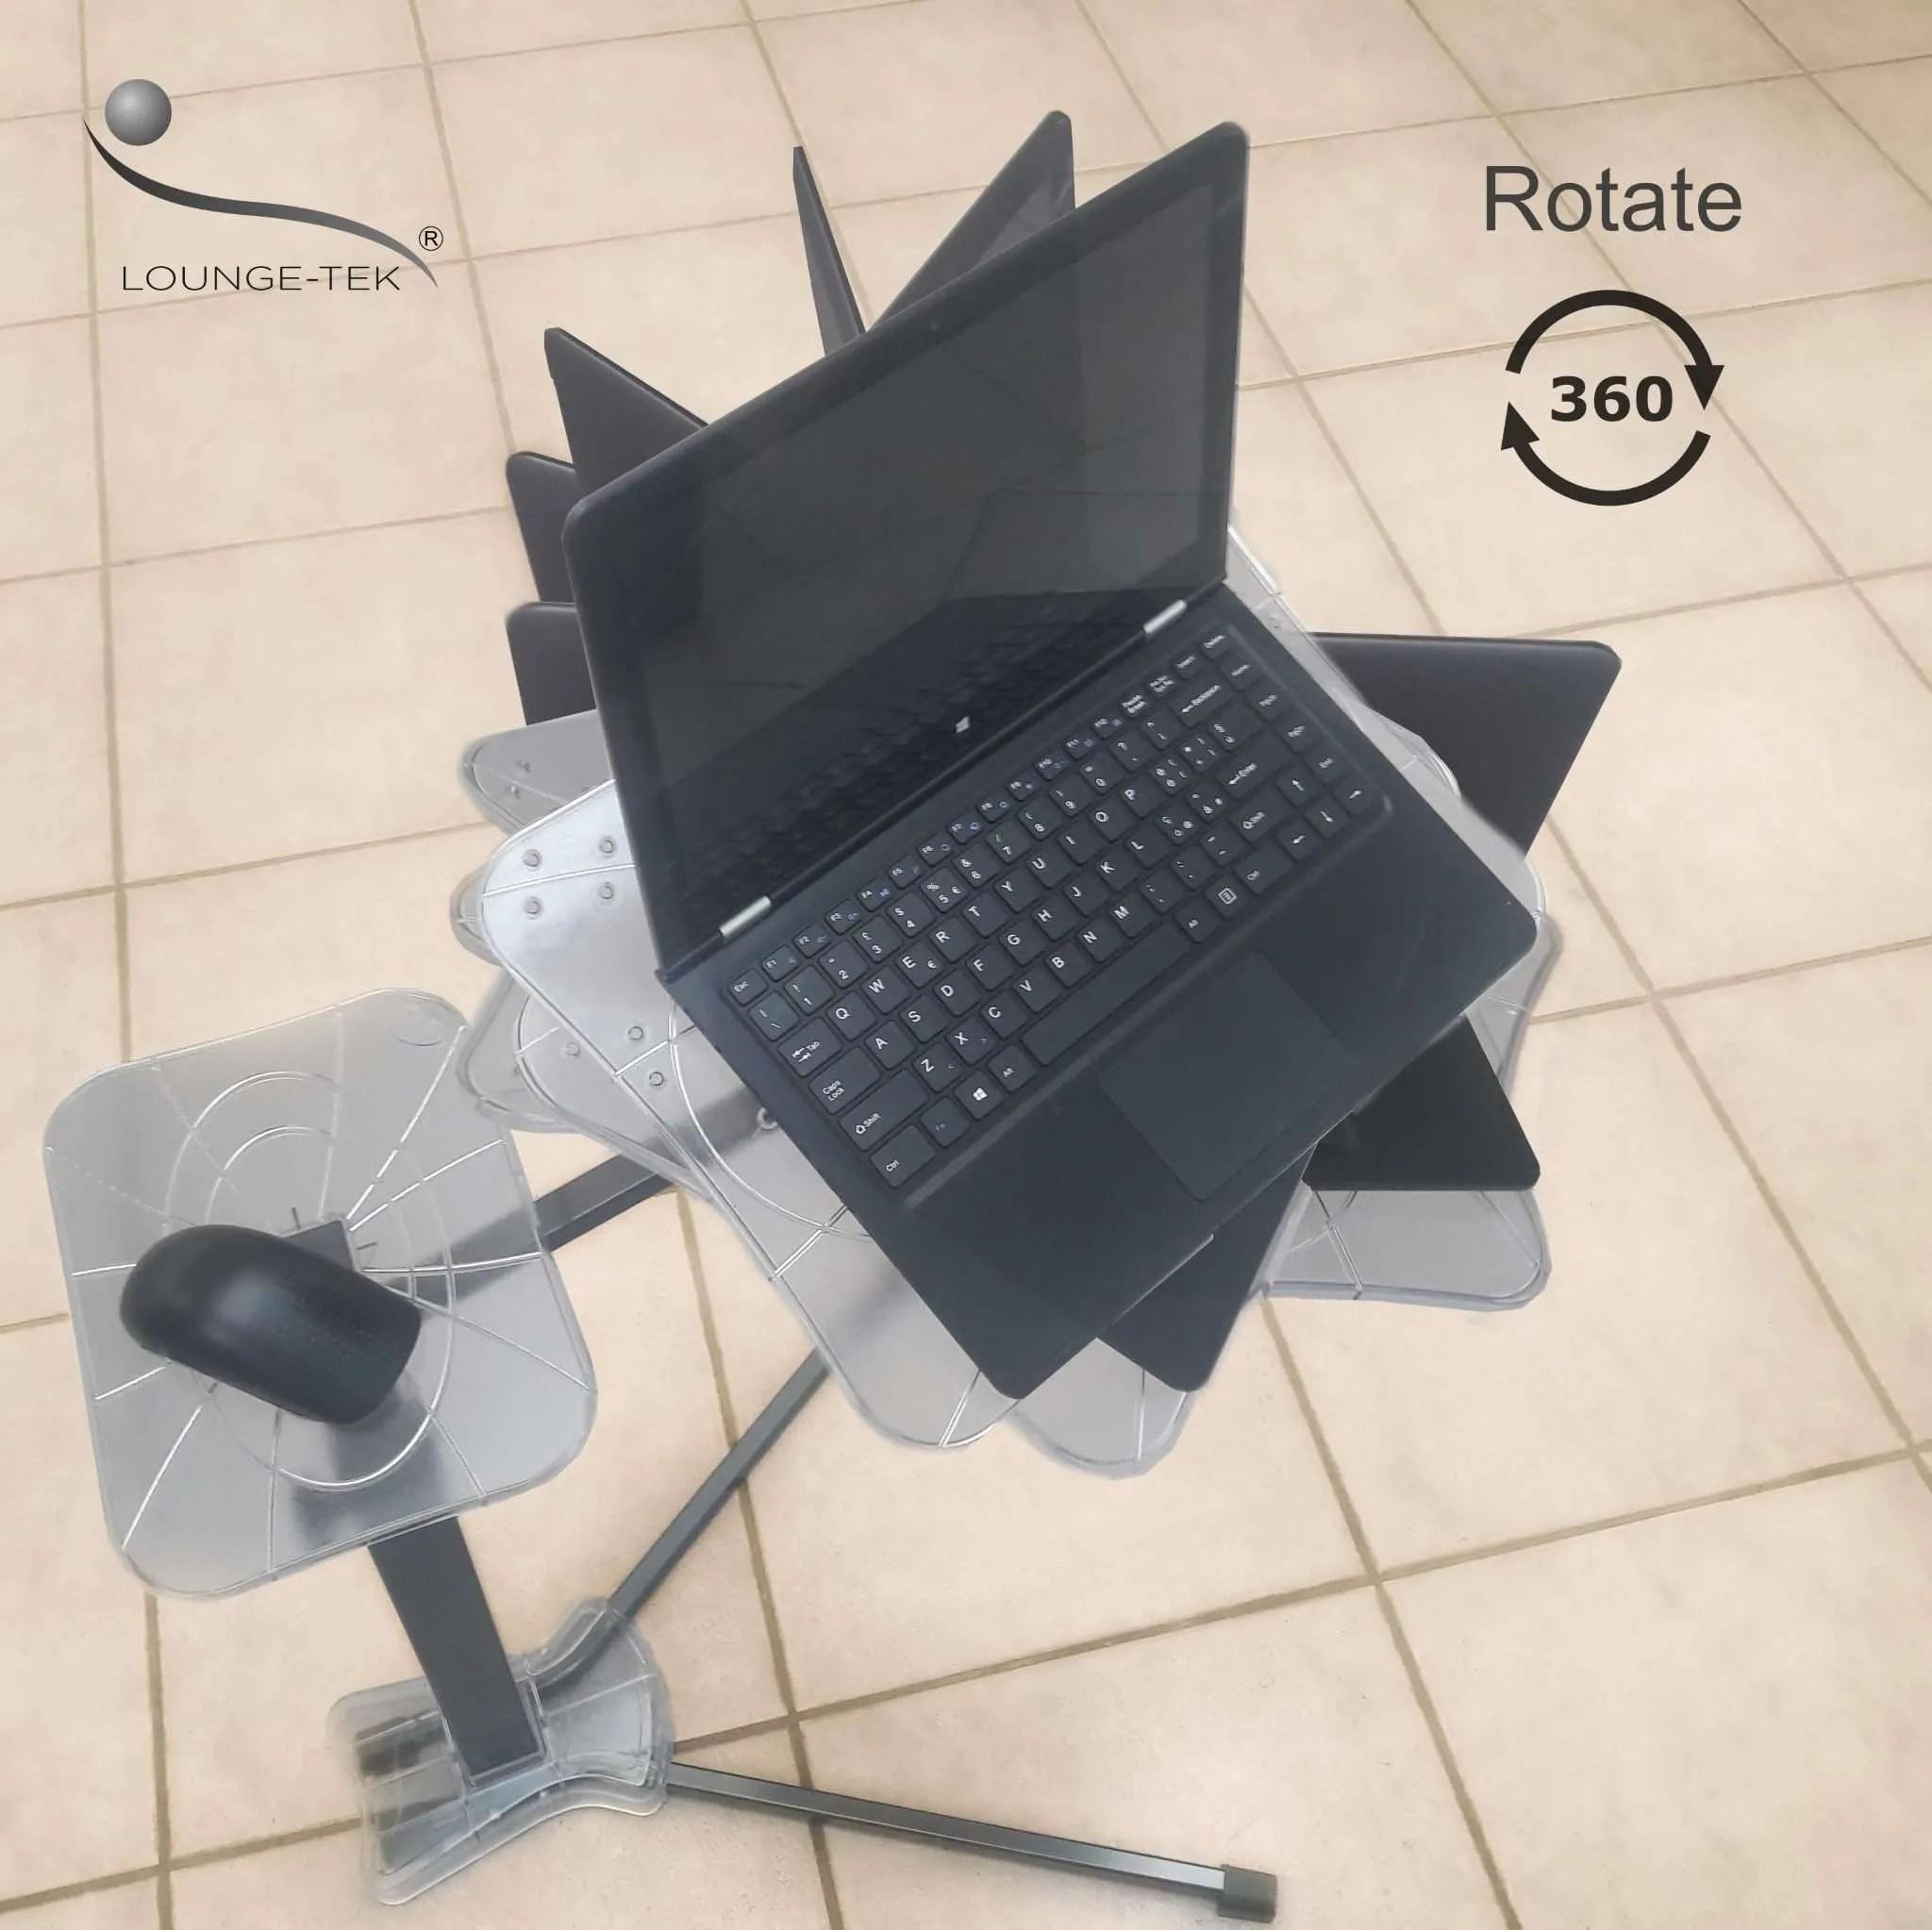 ergonomic support rotate 360_2048web